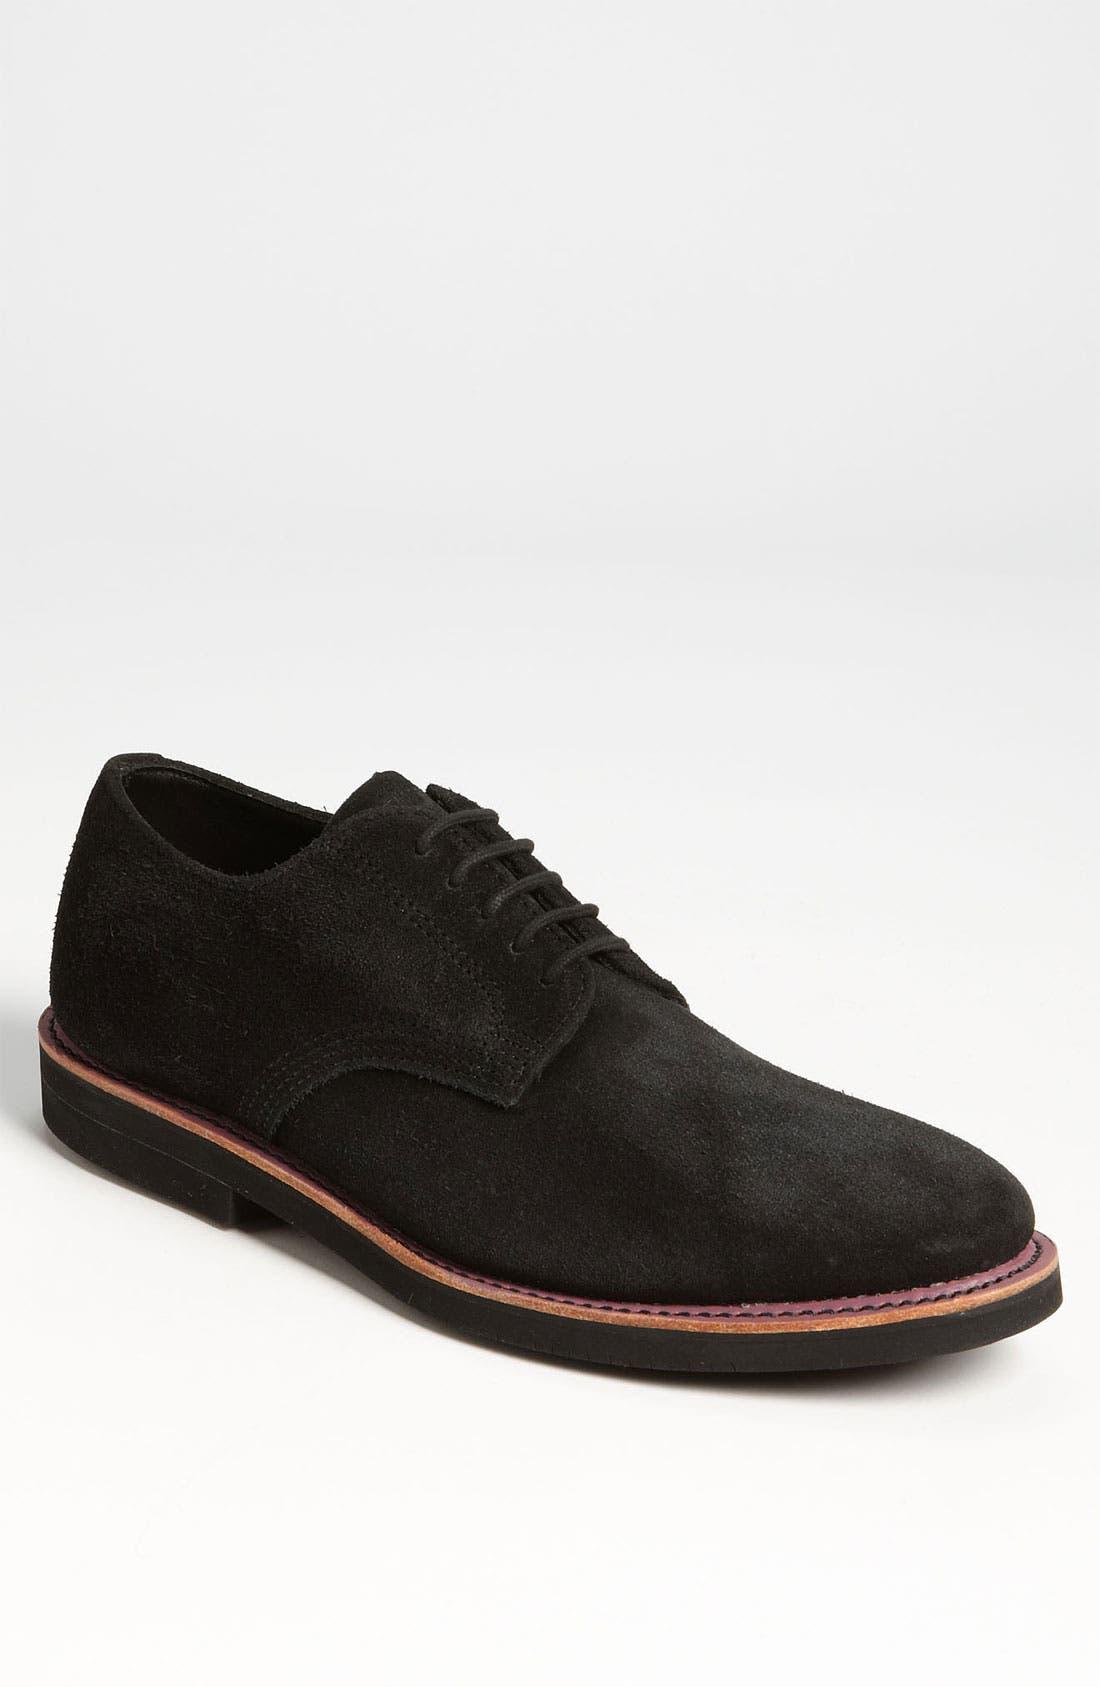 Alternate Image 1 Selected - Walk-Over 'Derby' Buck Shoe